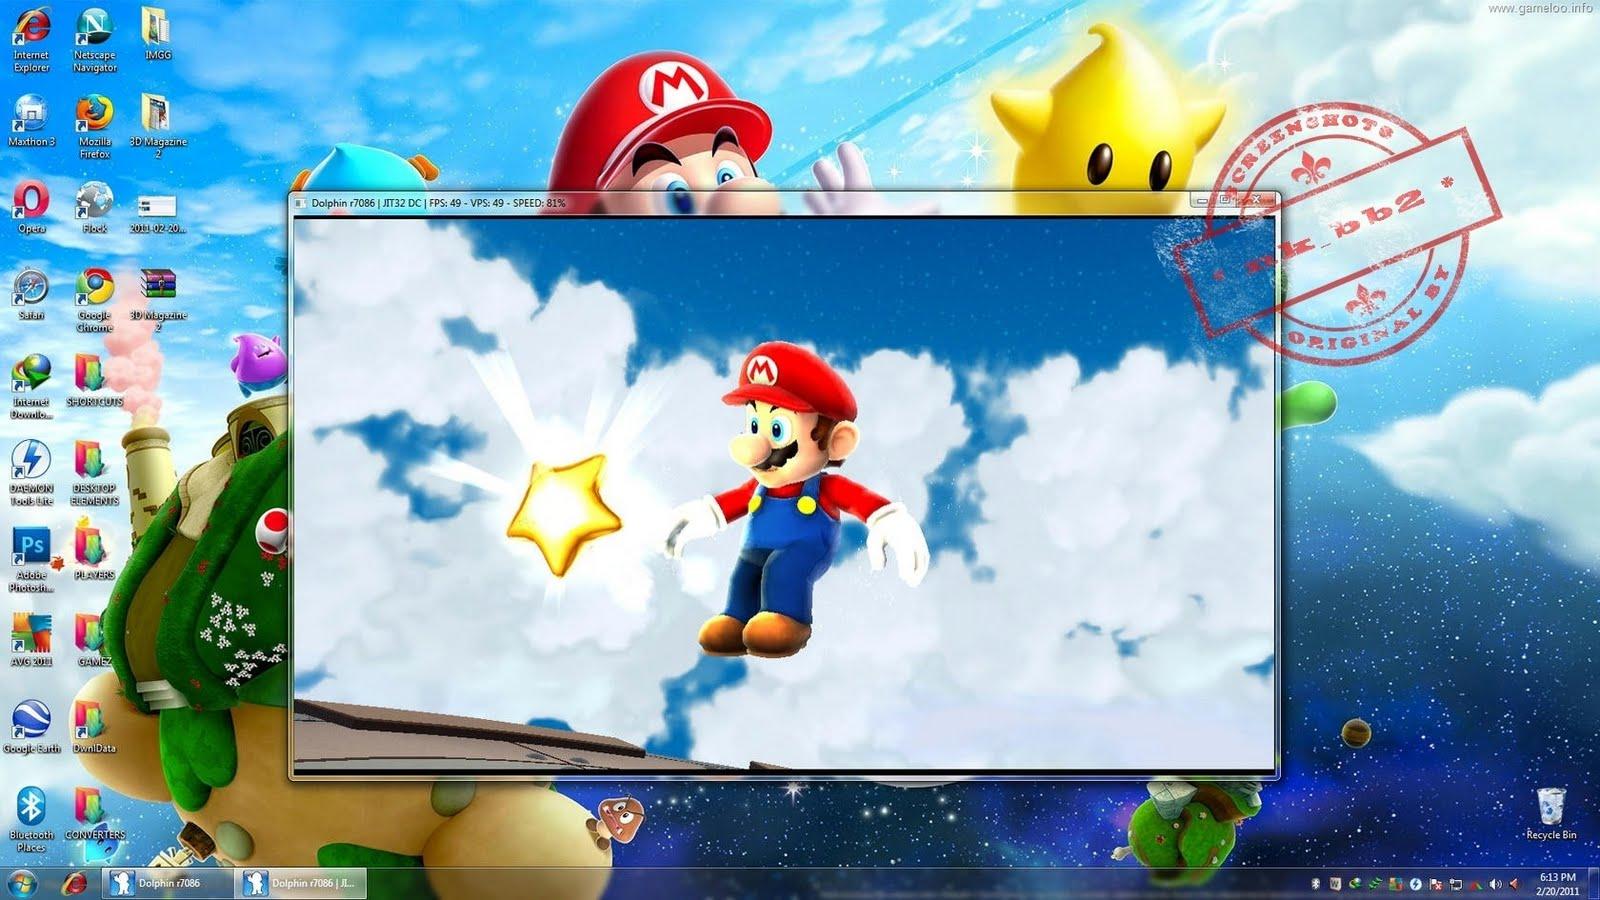 Super Mario Galaxy 2 (PC)–Dolphin Emulator 32 bit & 64 bit